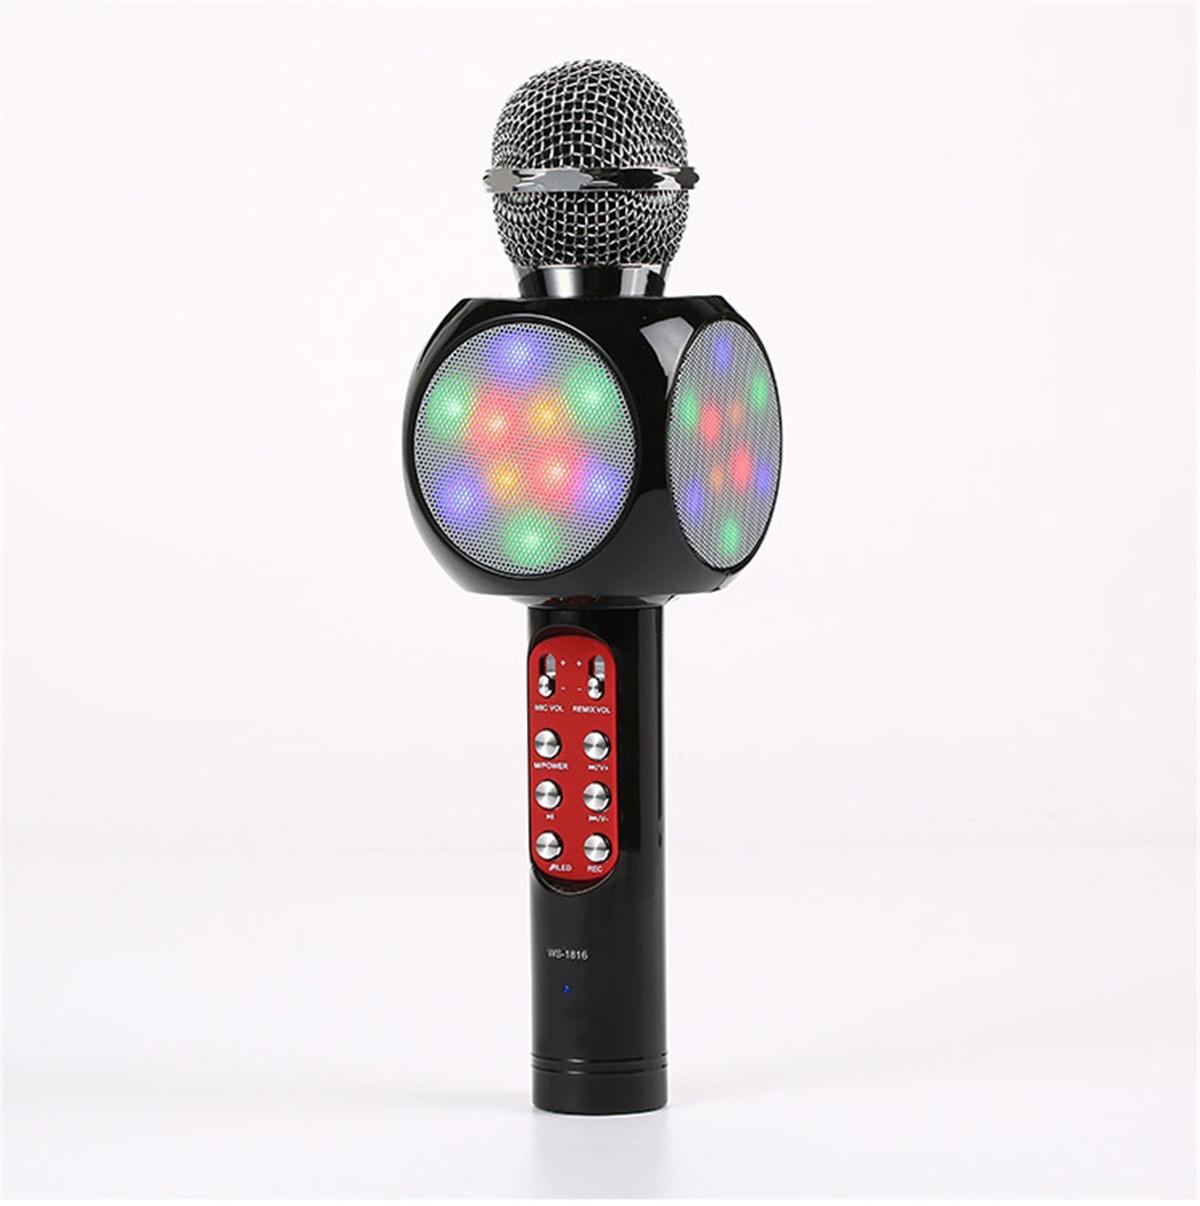 Portable-Wireless-Karaoke-Microphone-Bluetooth-USB-KTV-Mic-Player-Loud-Speaker